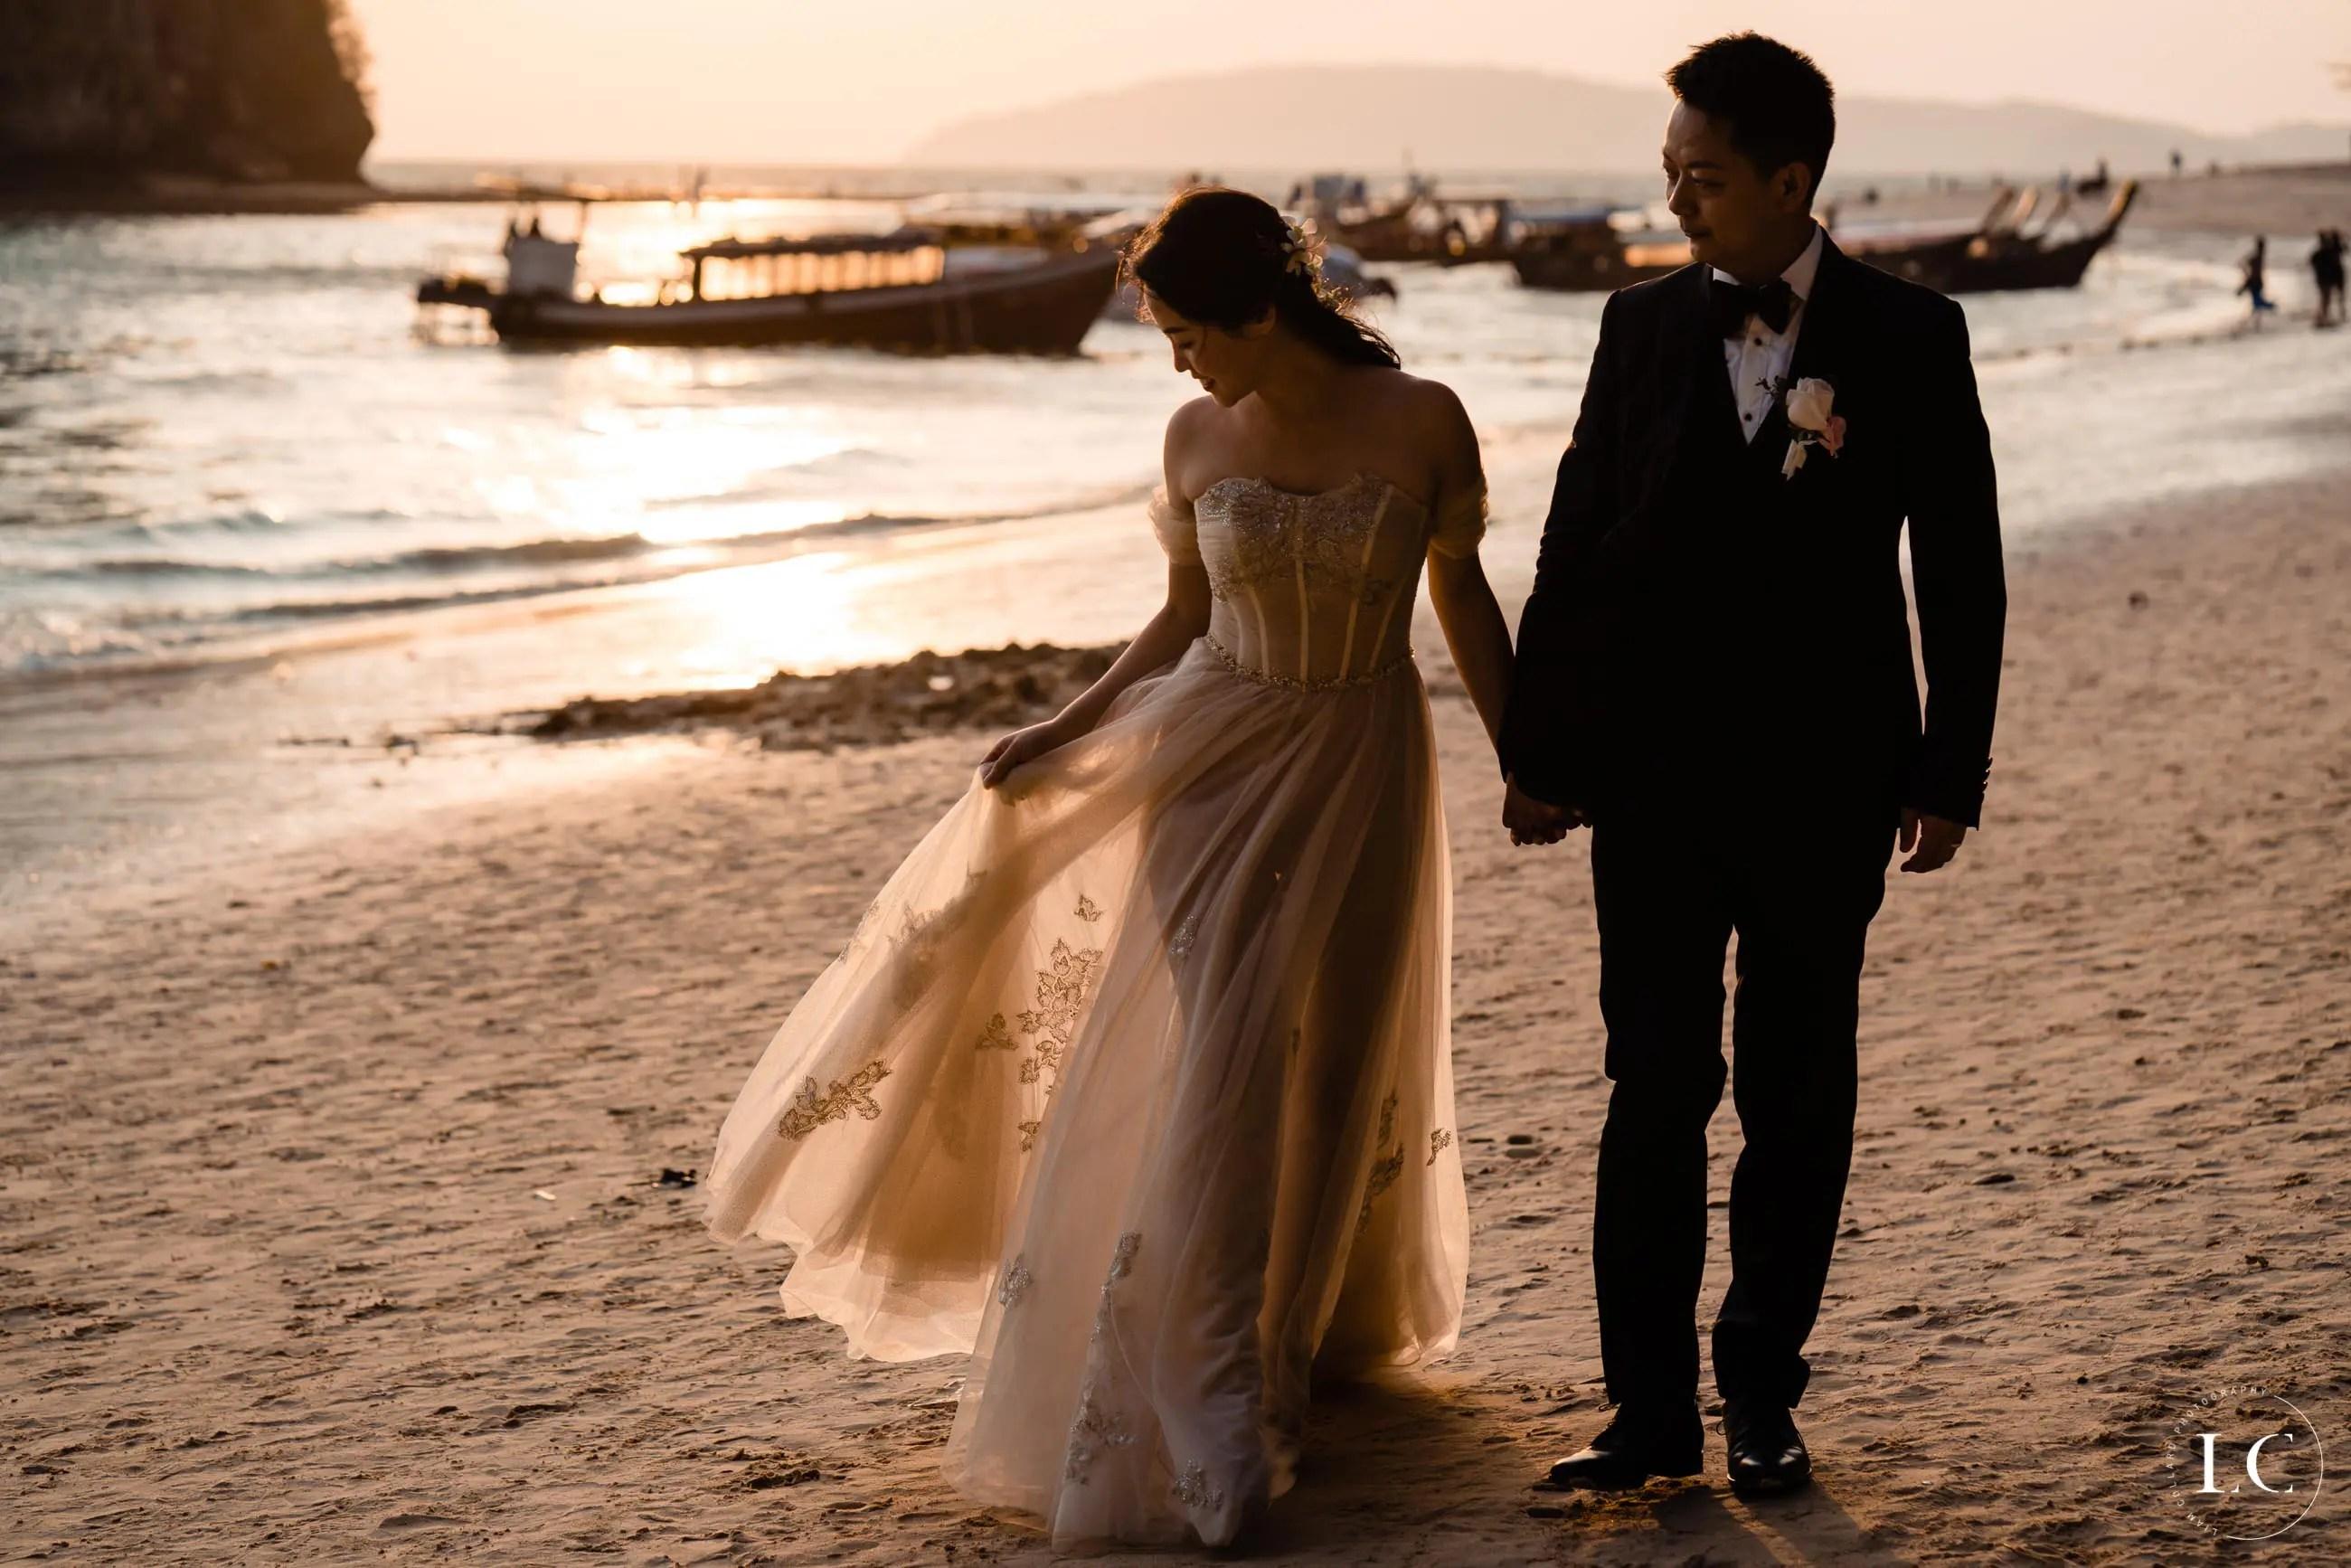 Newly weds walking on beach